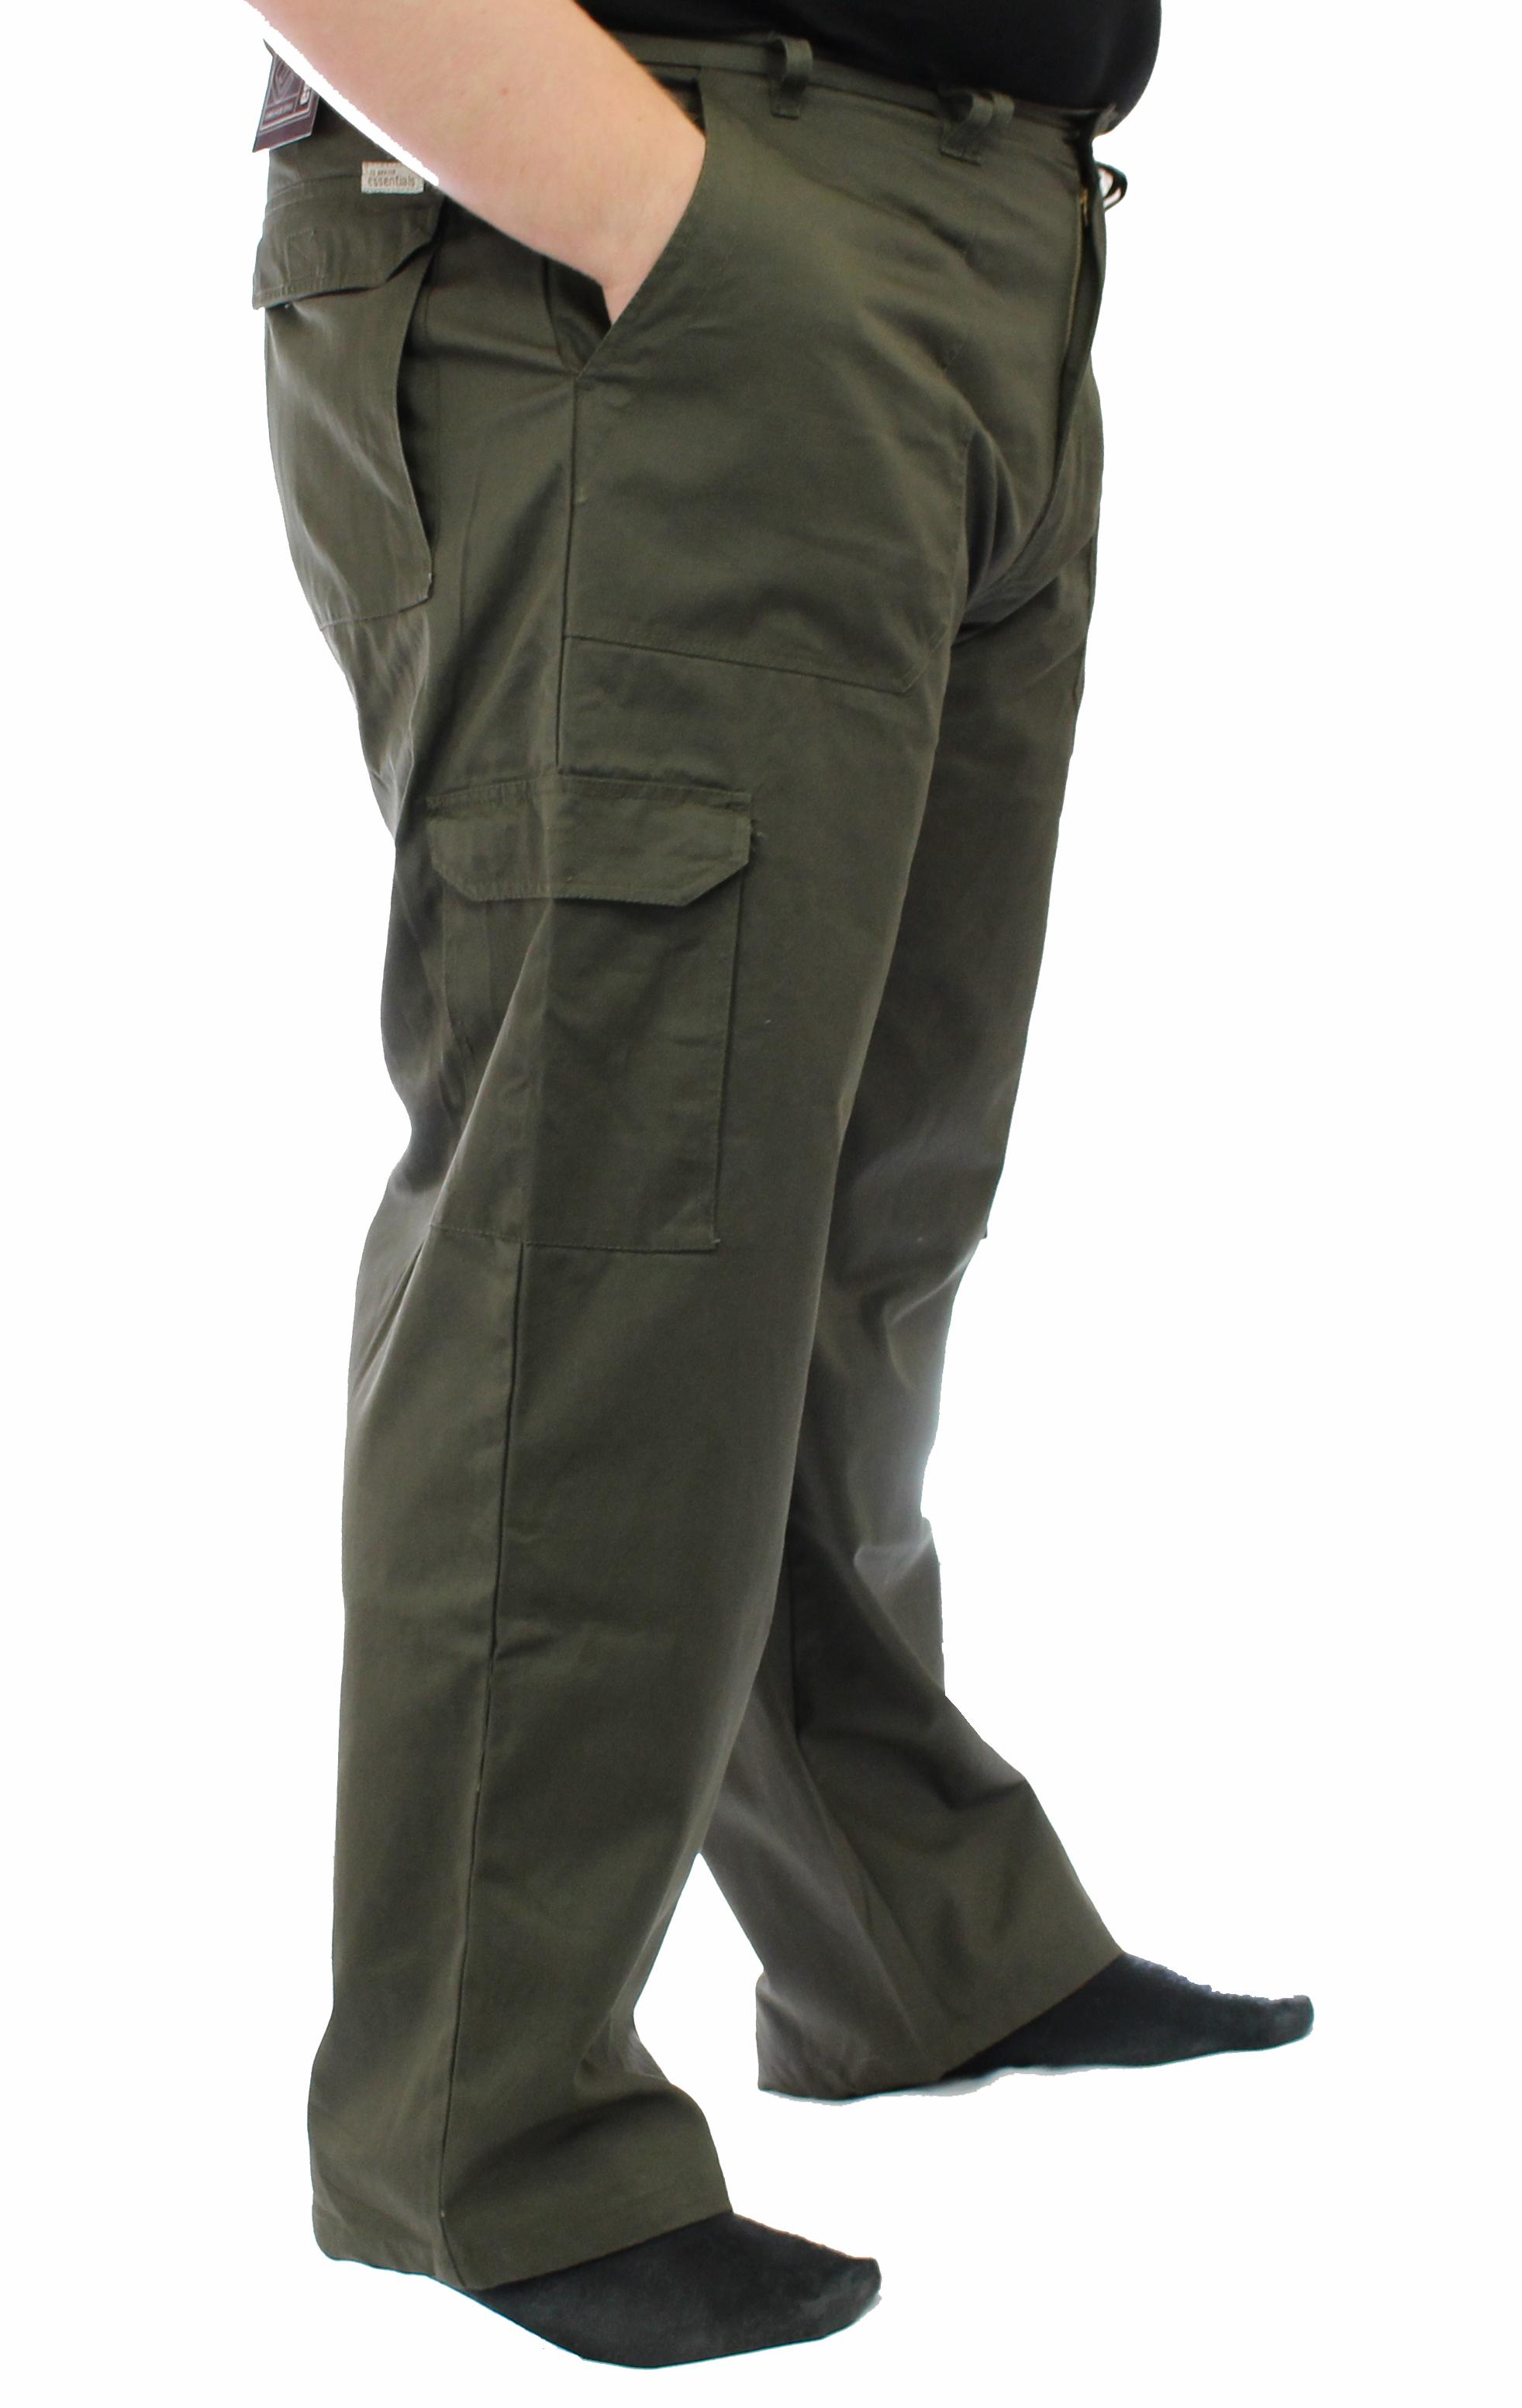 "Ed Baxter Victory - Heavy Duty Cargo Combat Trousers - Khaki - 54"" Waist, 32"" Leg"